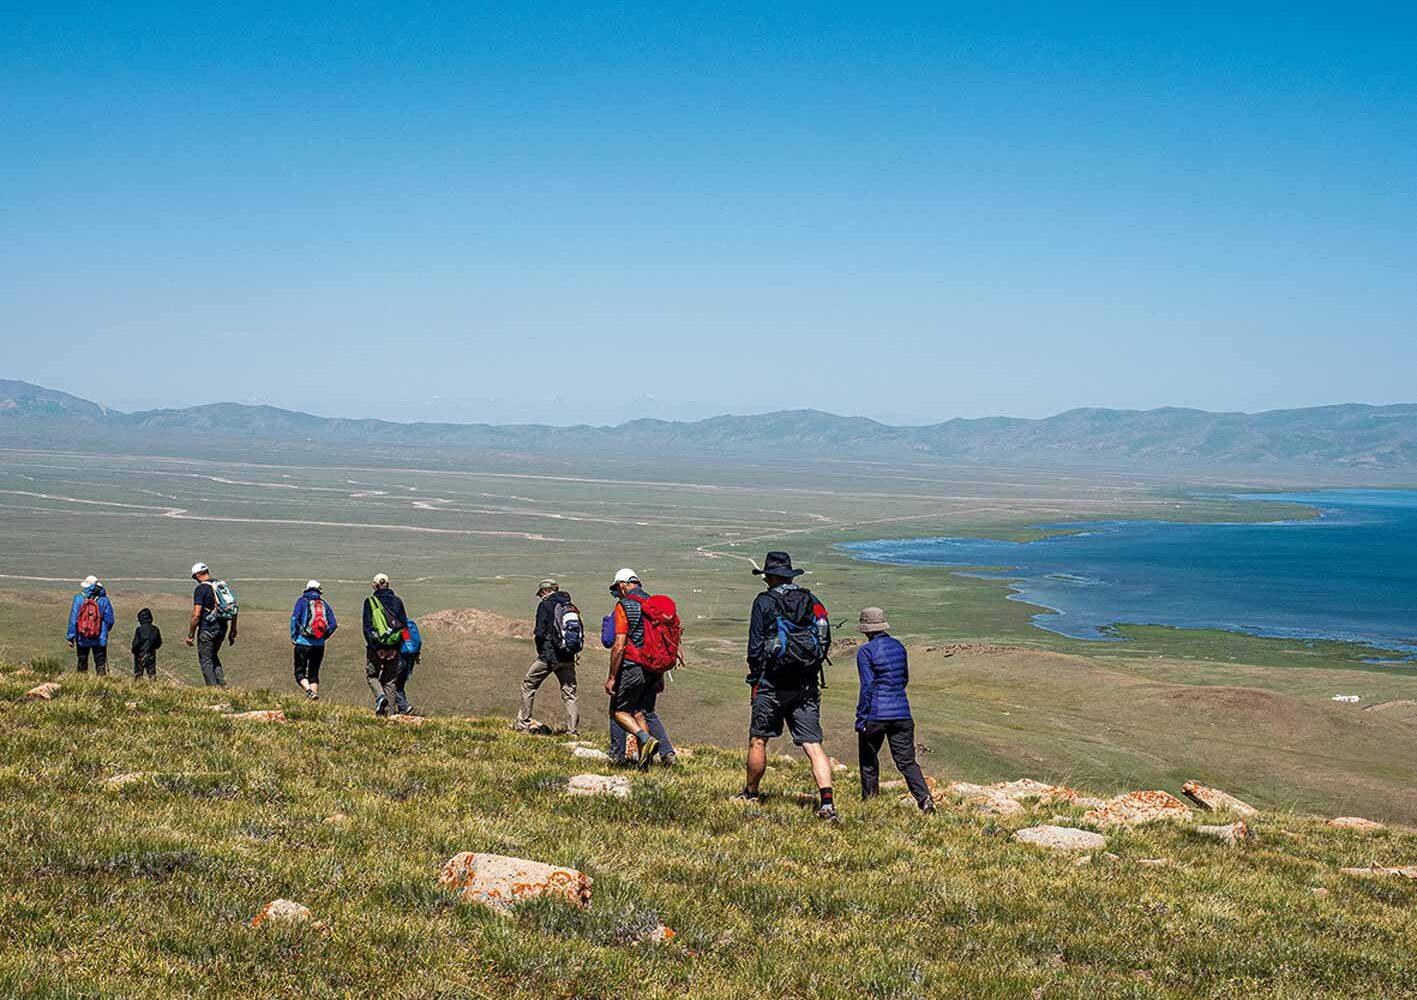 Wandergruppe in Kirgisien